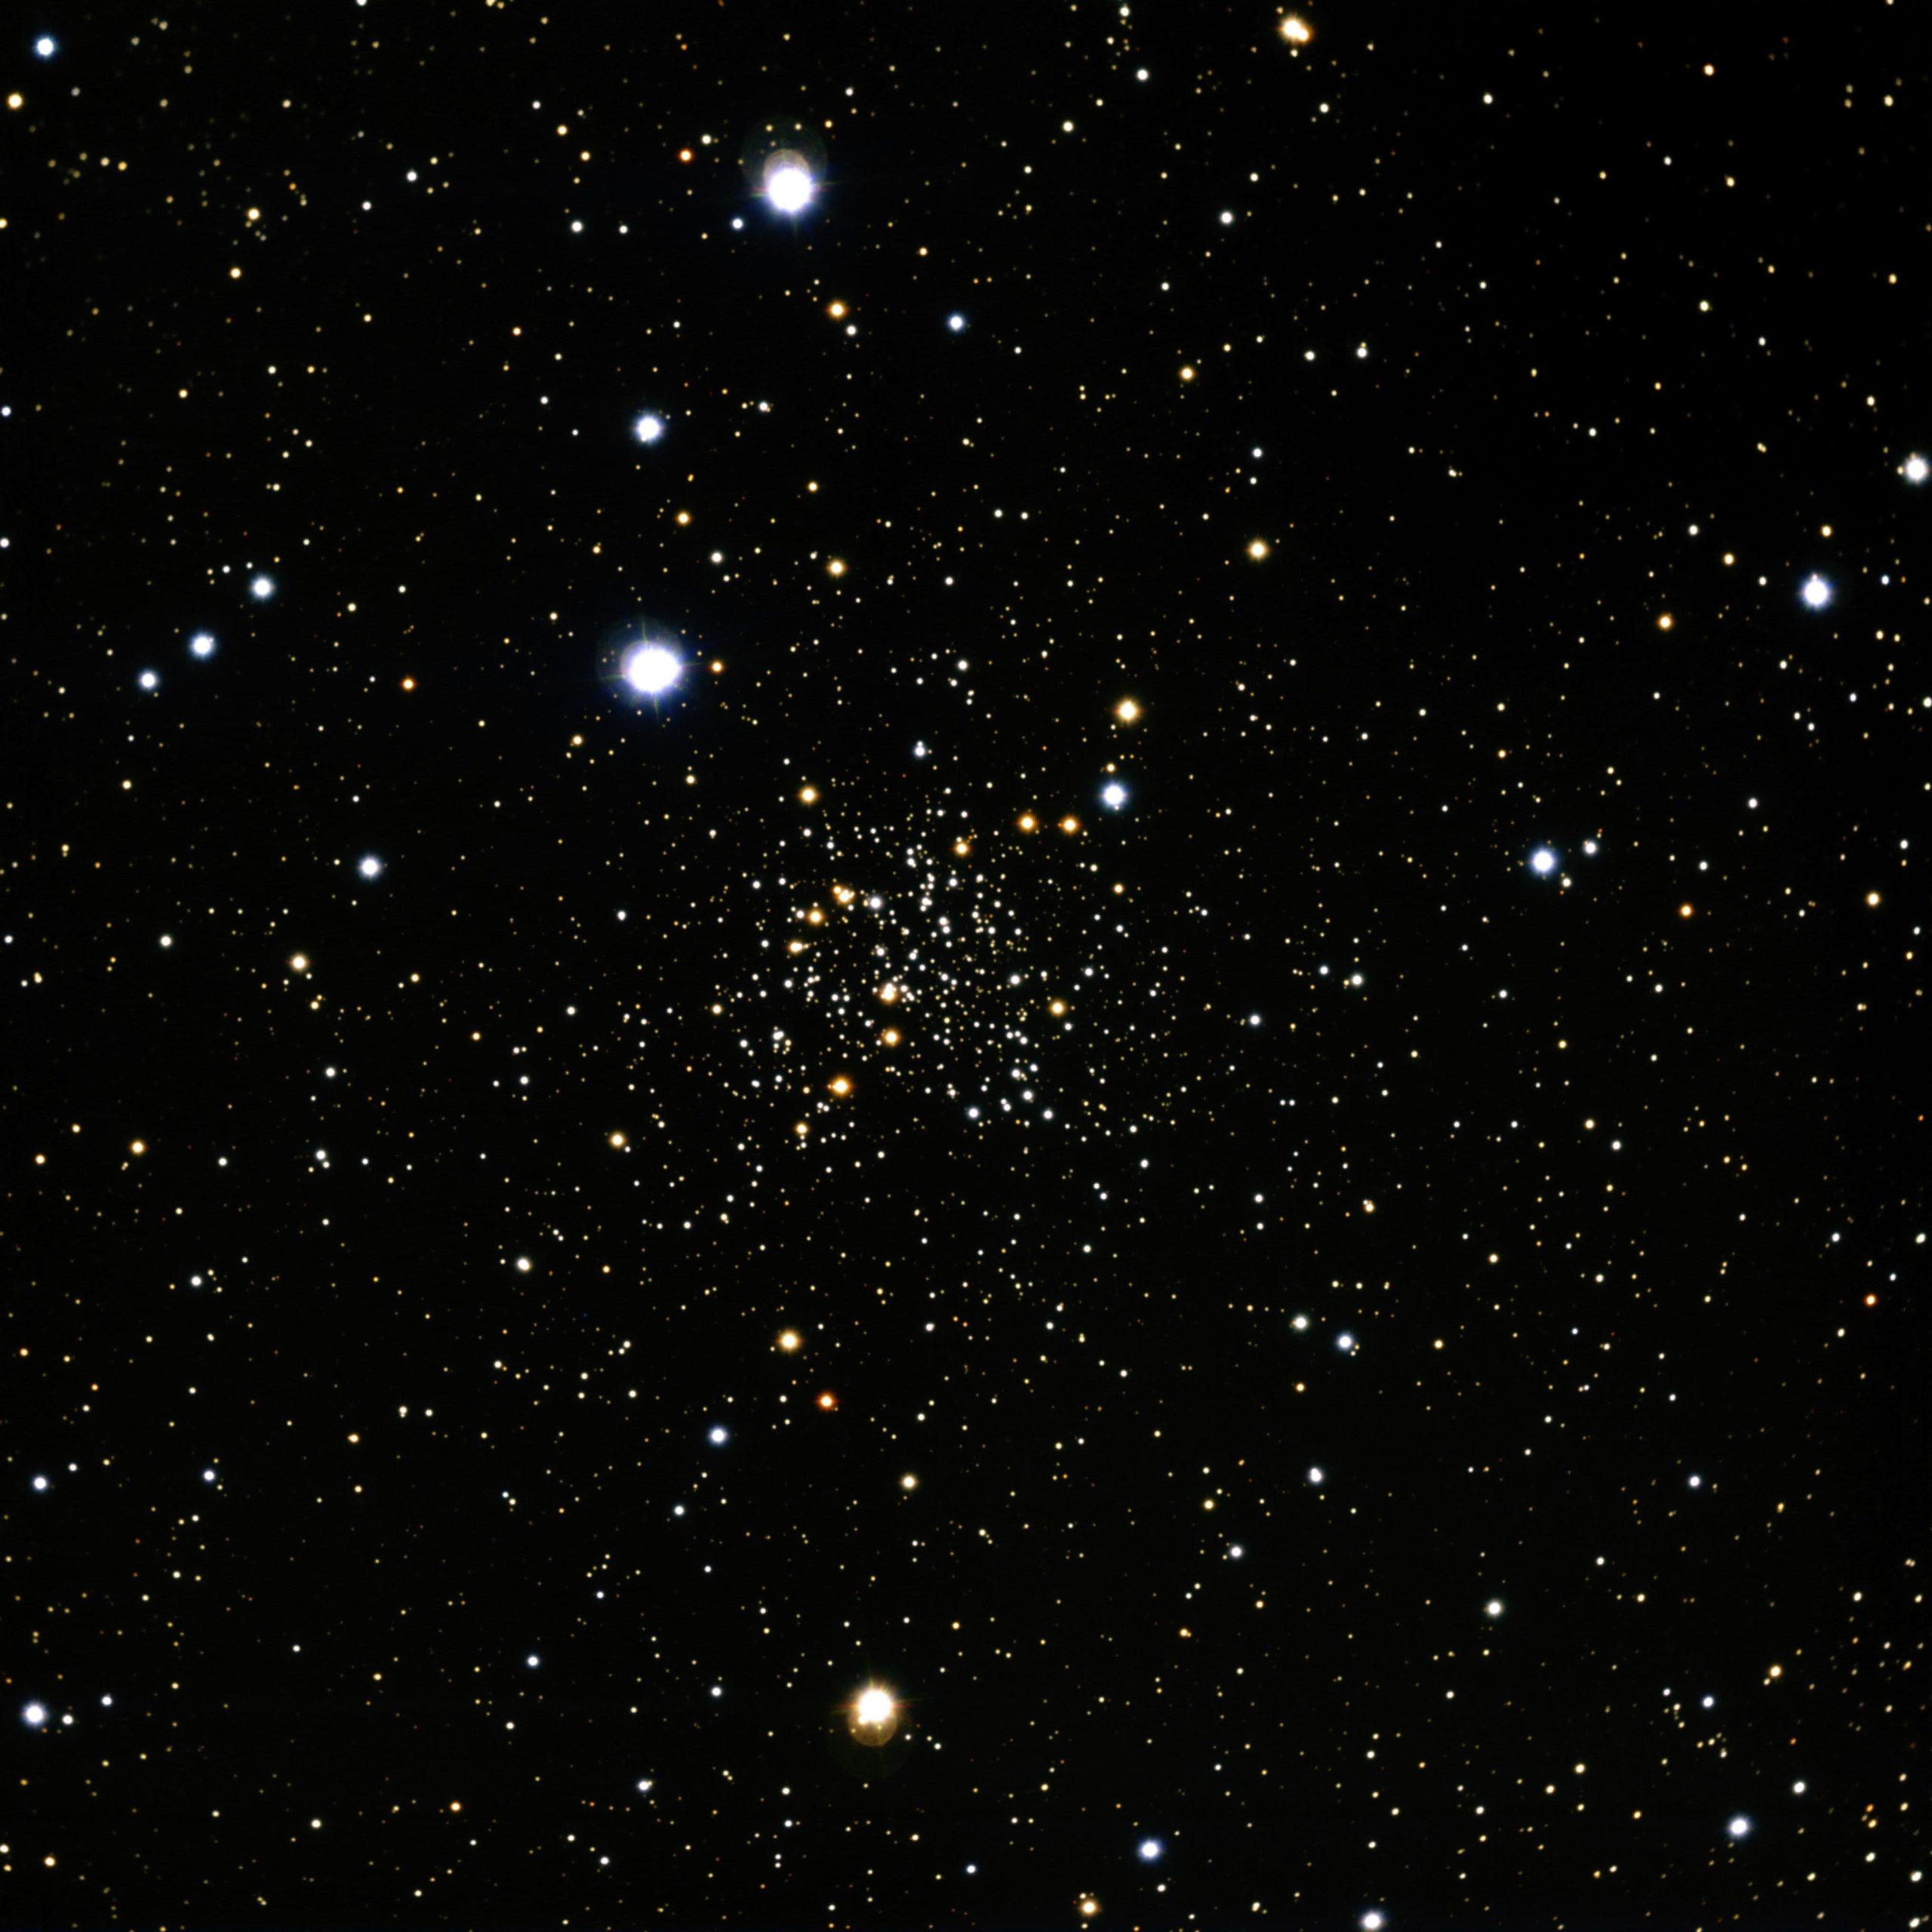 Open cluster NGC 609